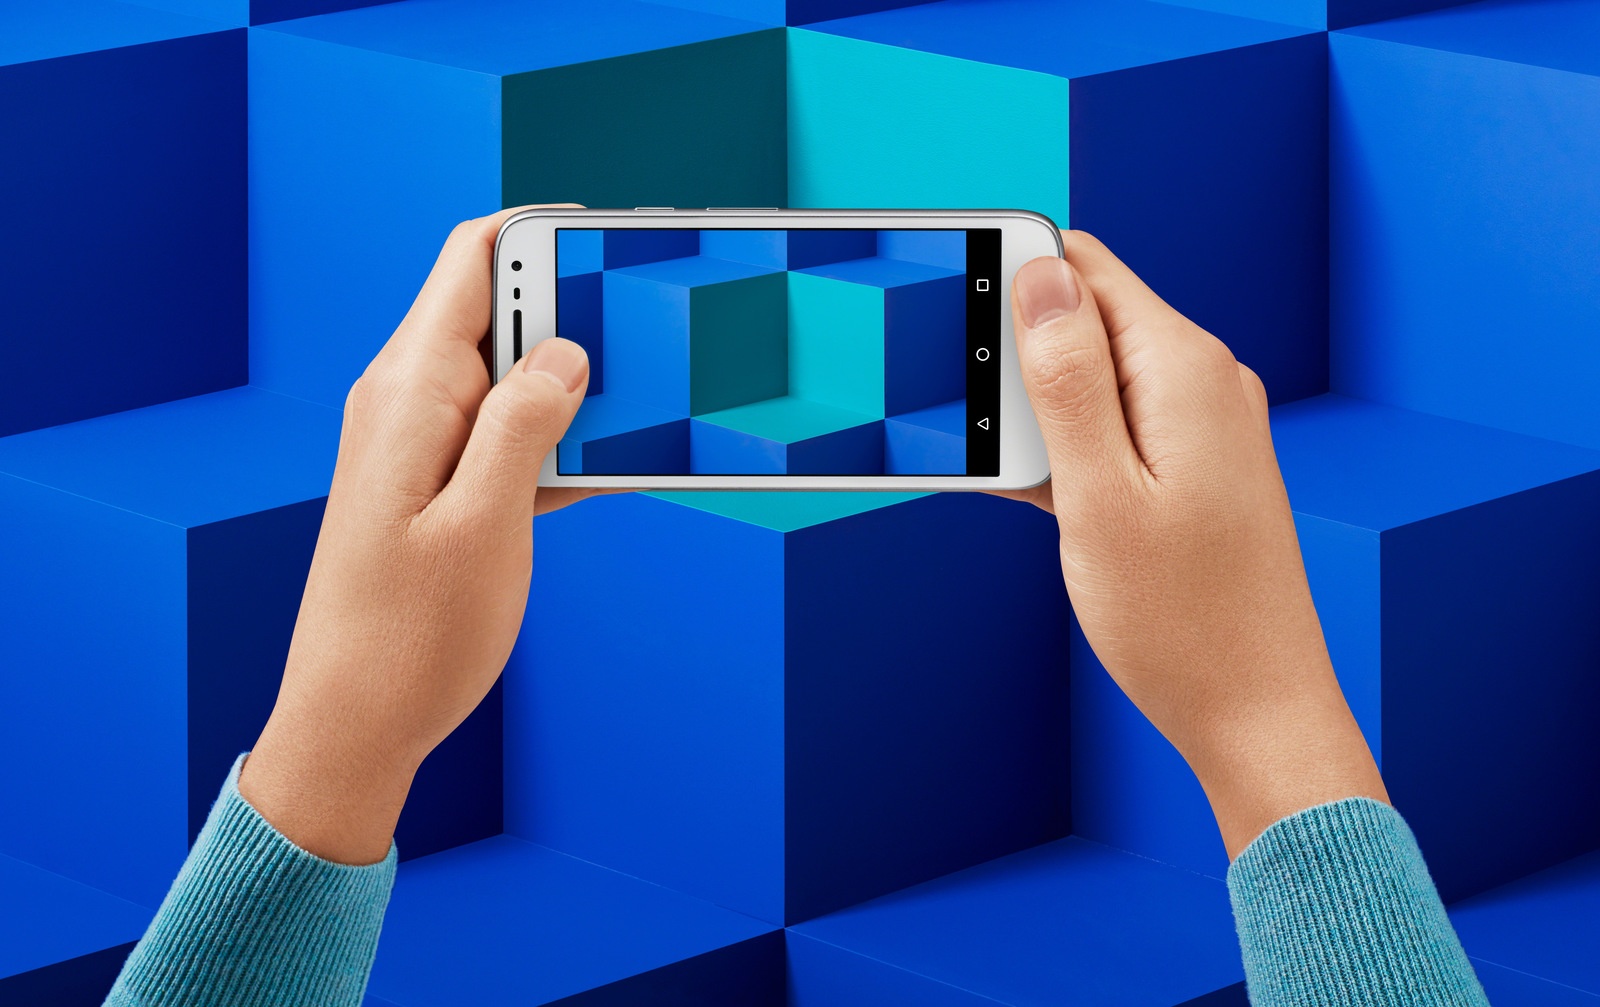 Смартфоны Moto G4, Moto G4 Plus и Moto G4 Play - Moto G4 Play (5)